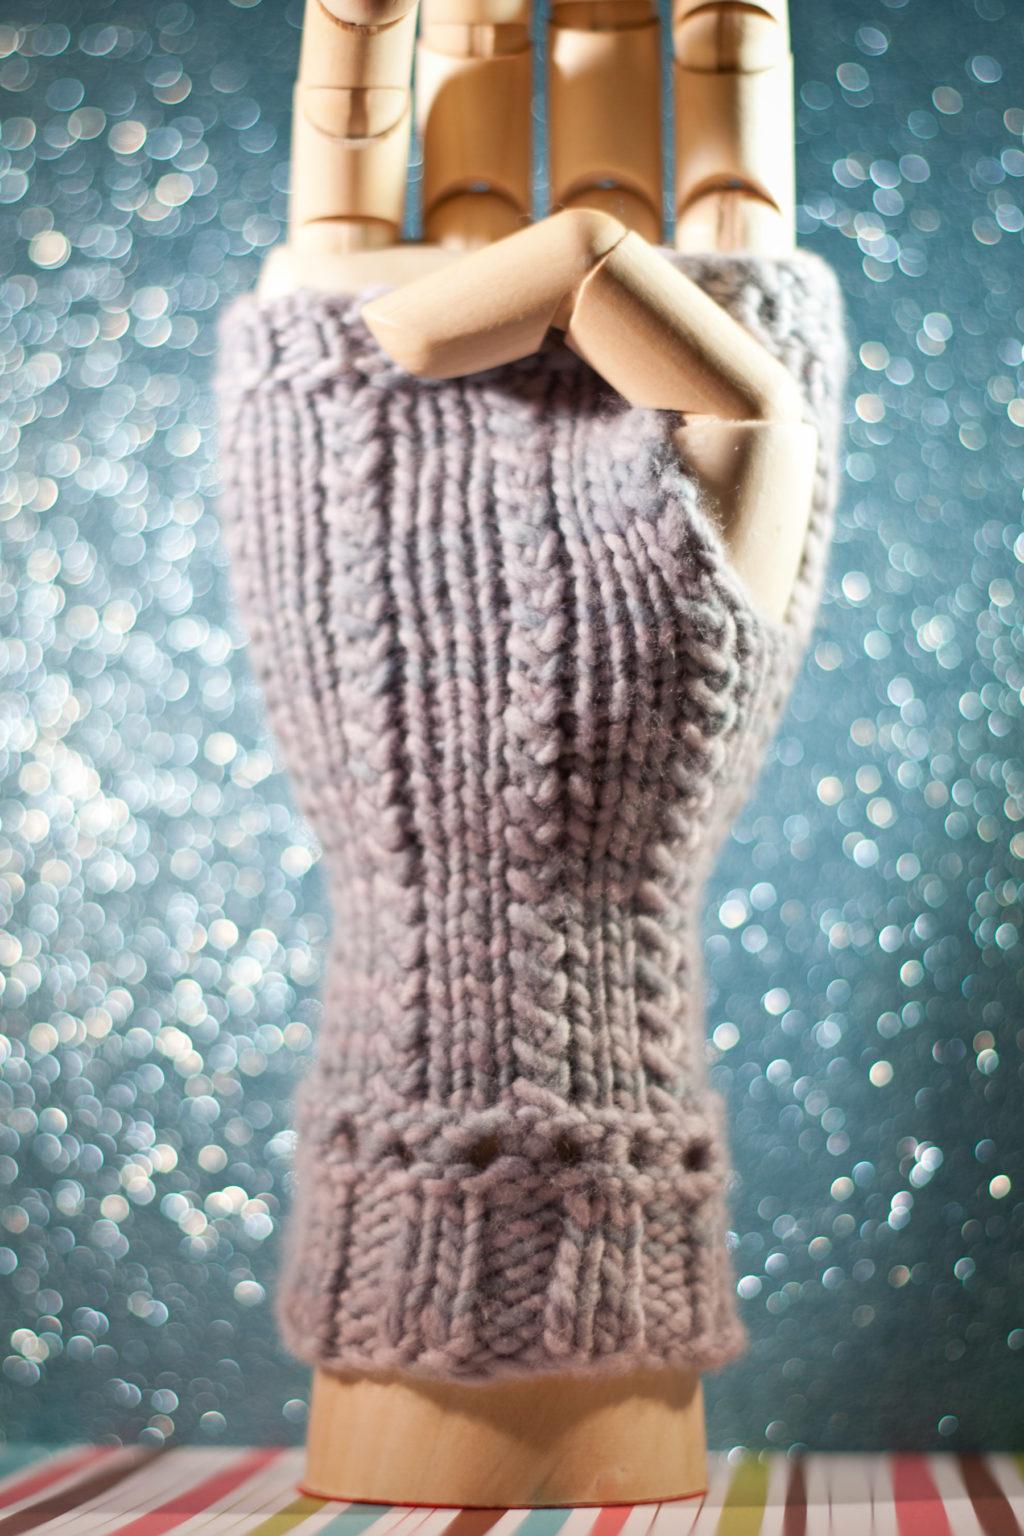 Blades of Grass knitting pattern | katili*made | https://www.katilimade.com